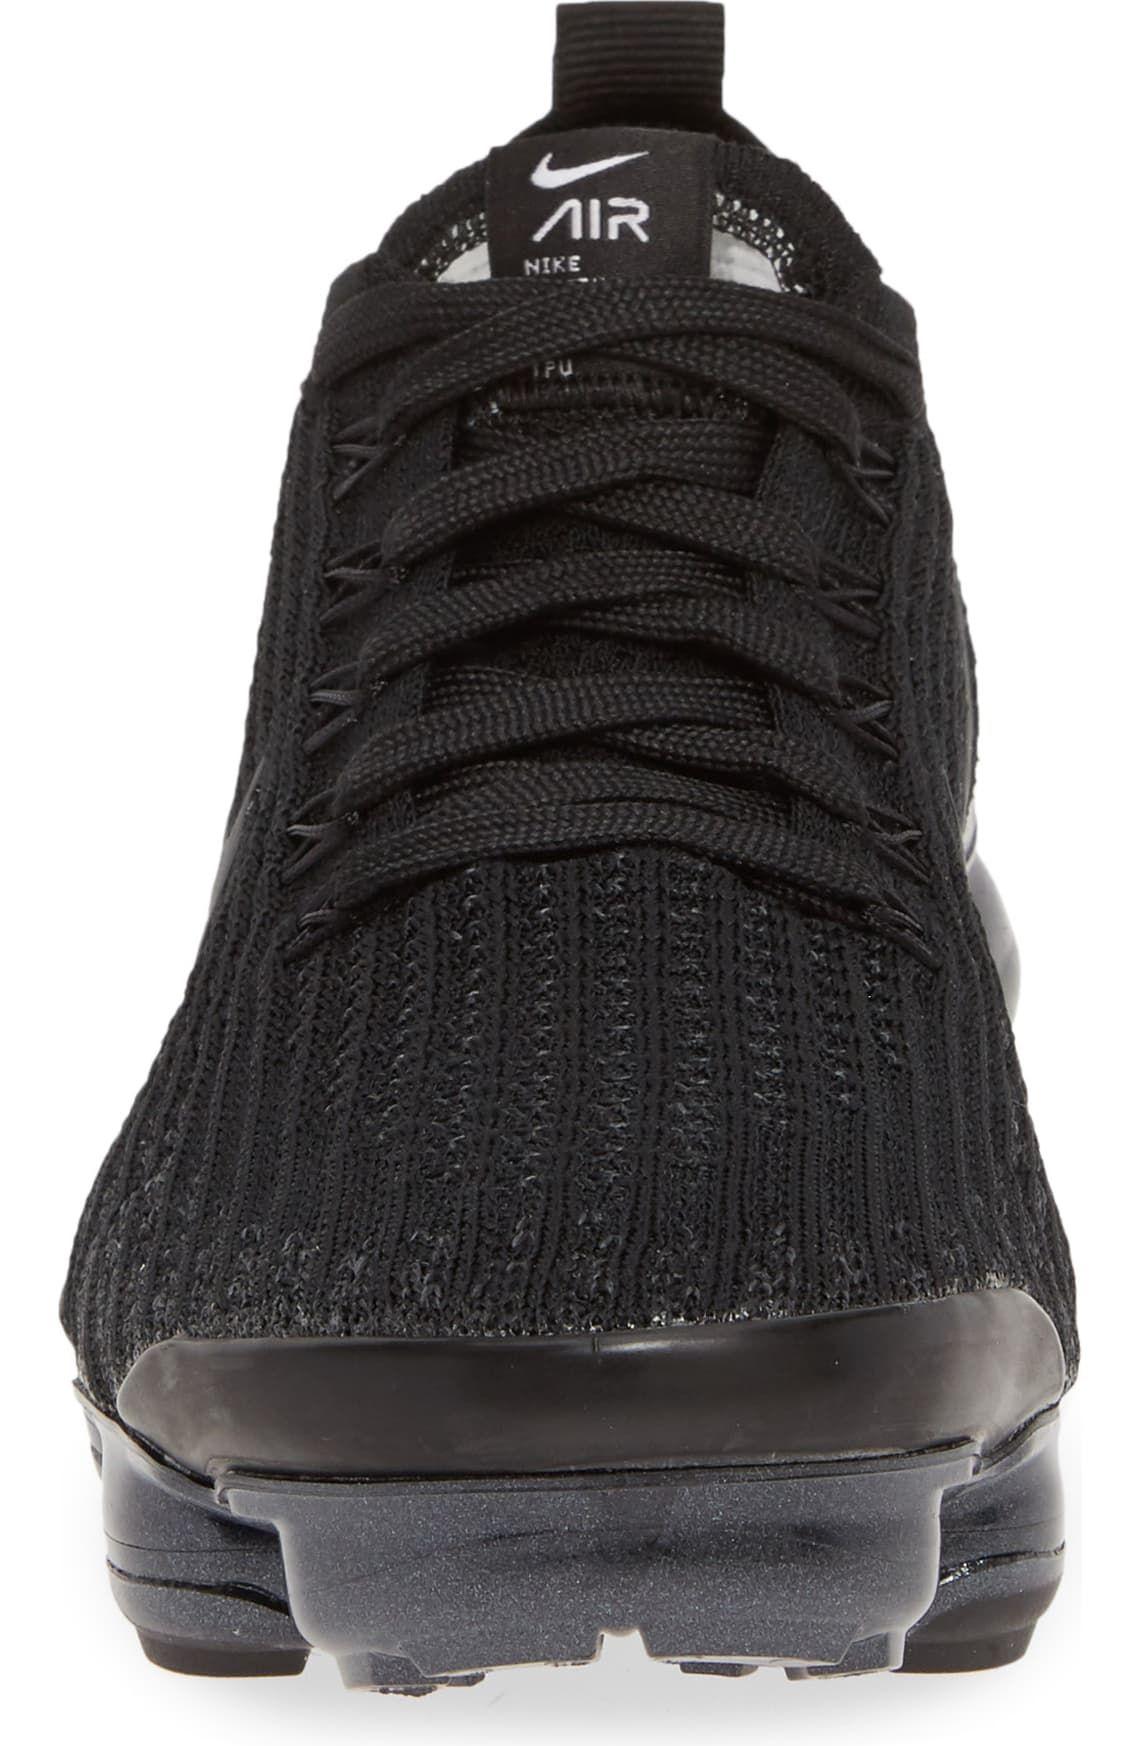 black knit vapormax